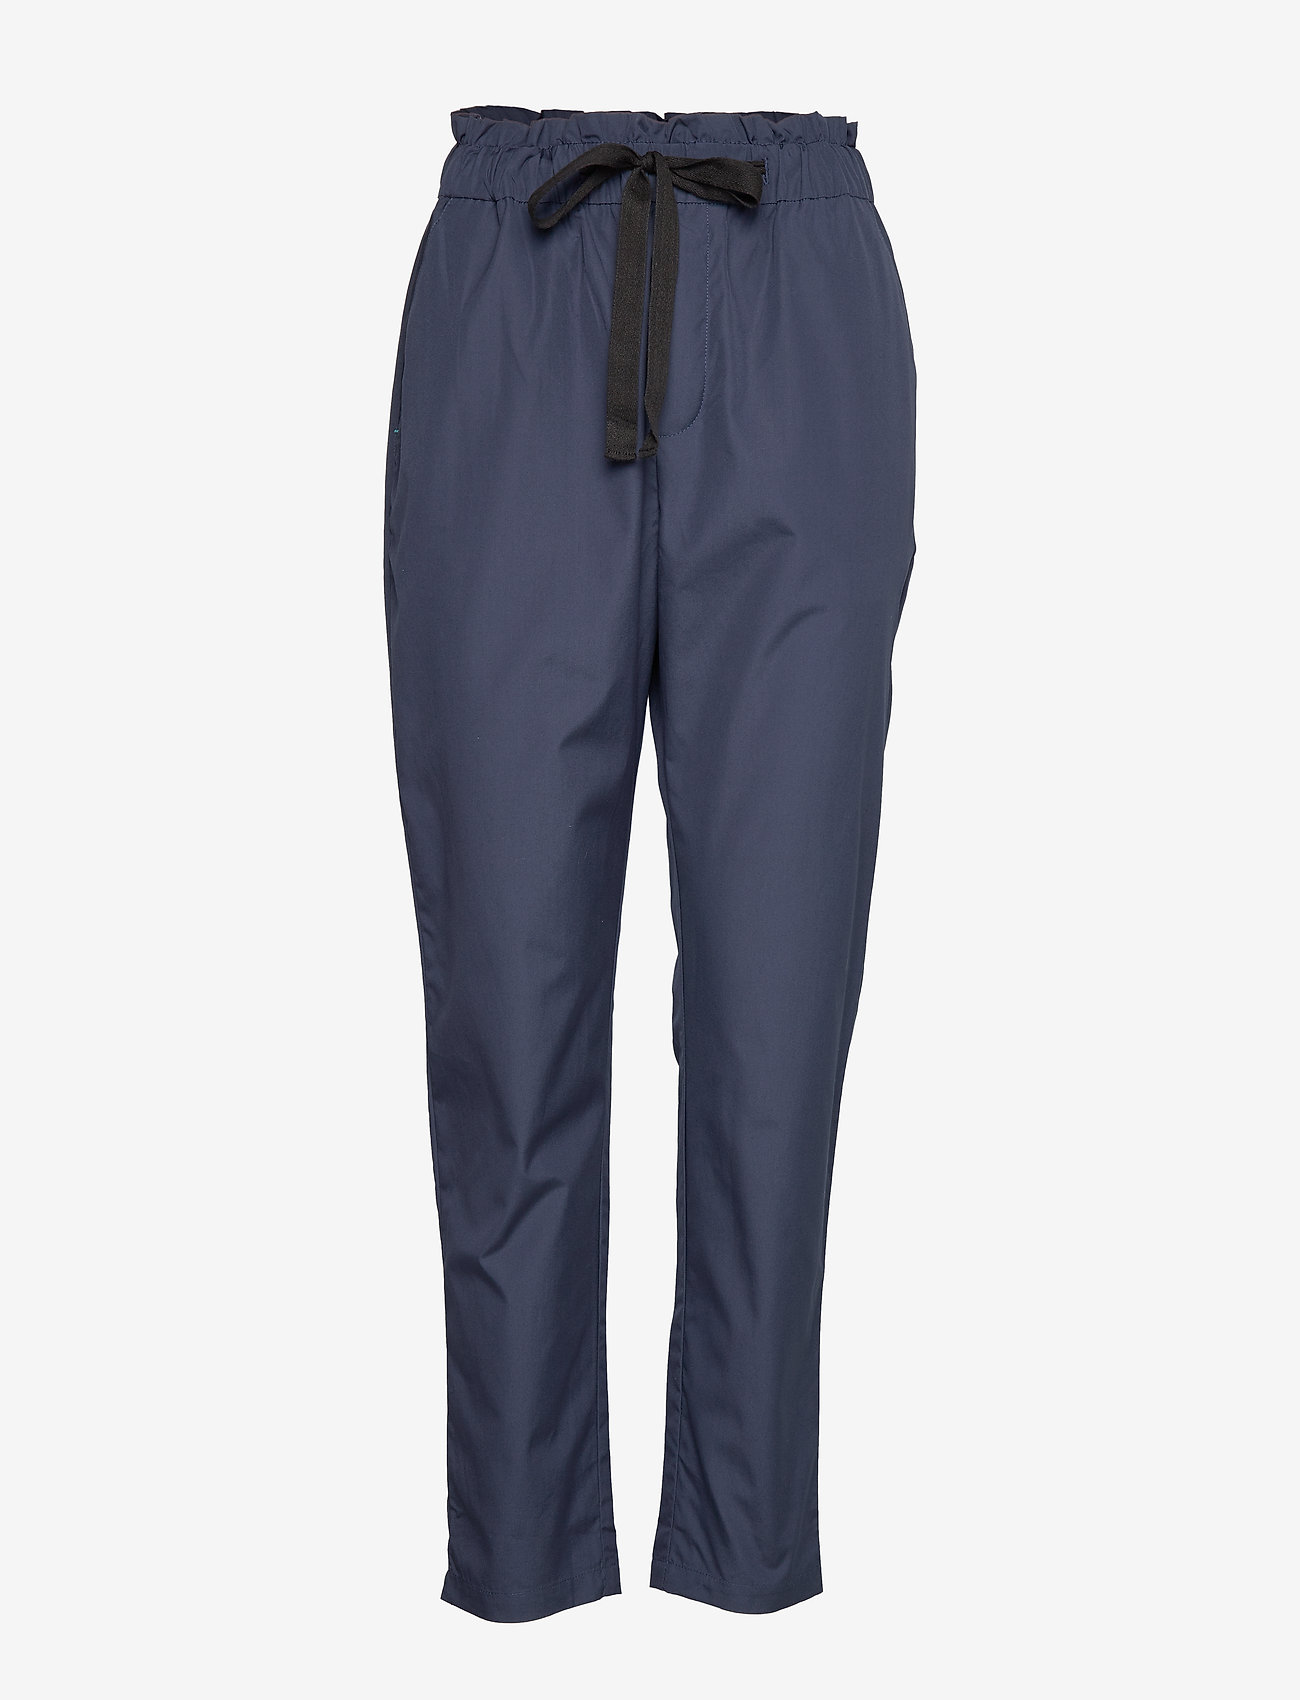 Noa Noa - Trousers - casual broeken - dress blues - 0